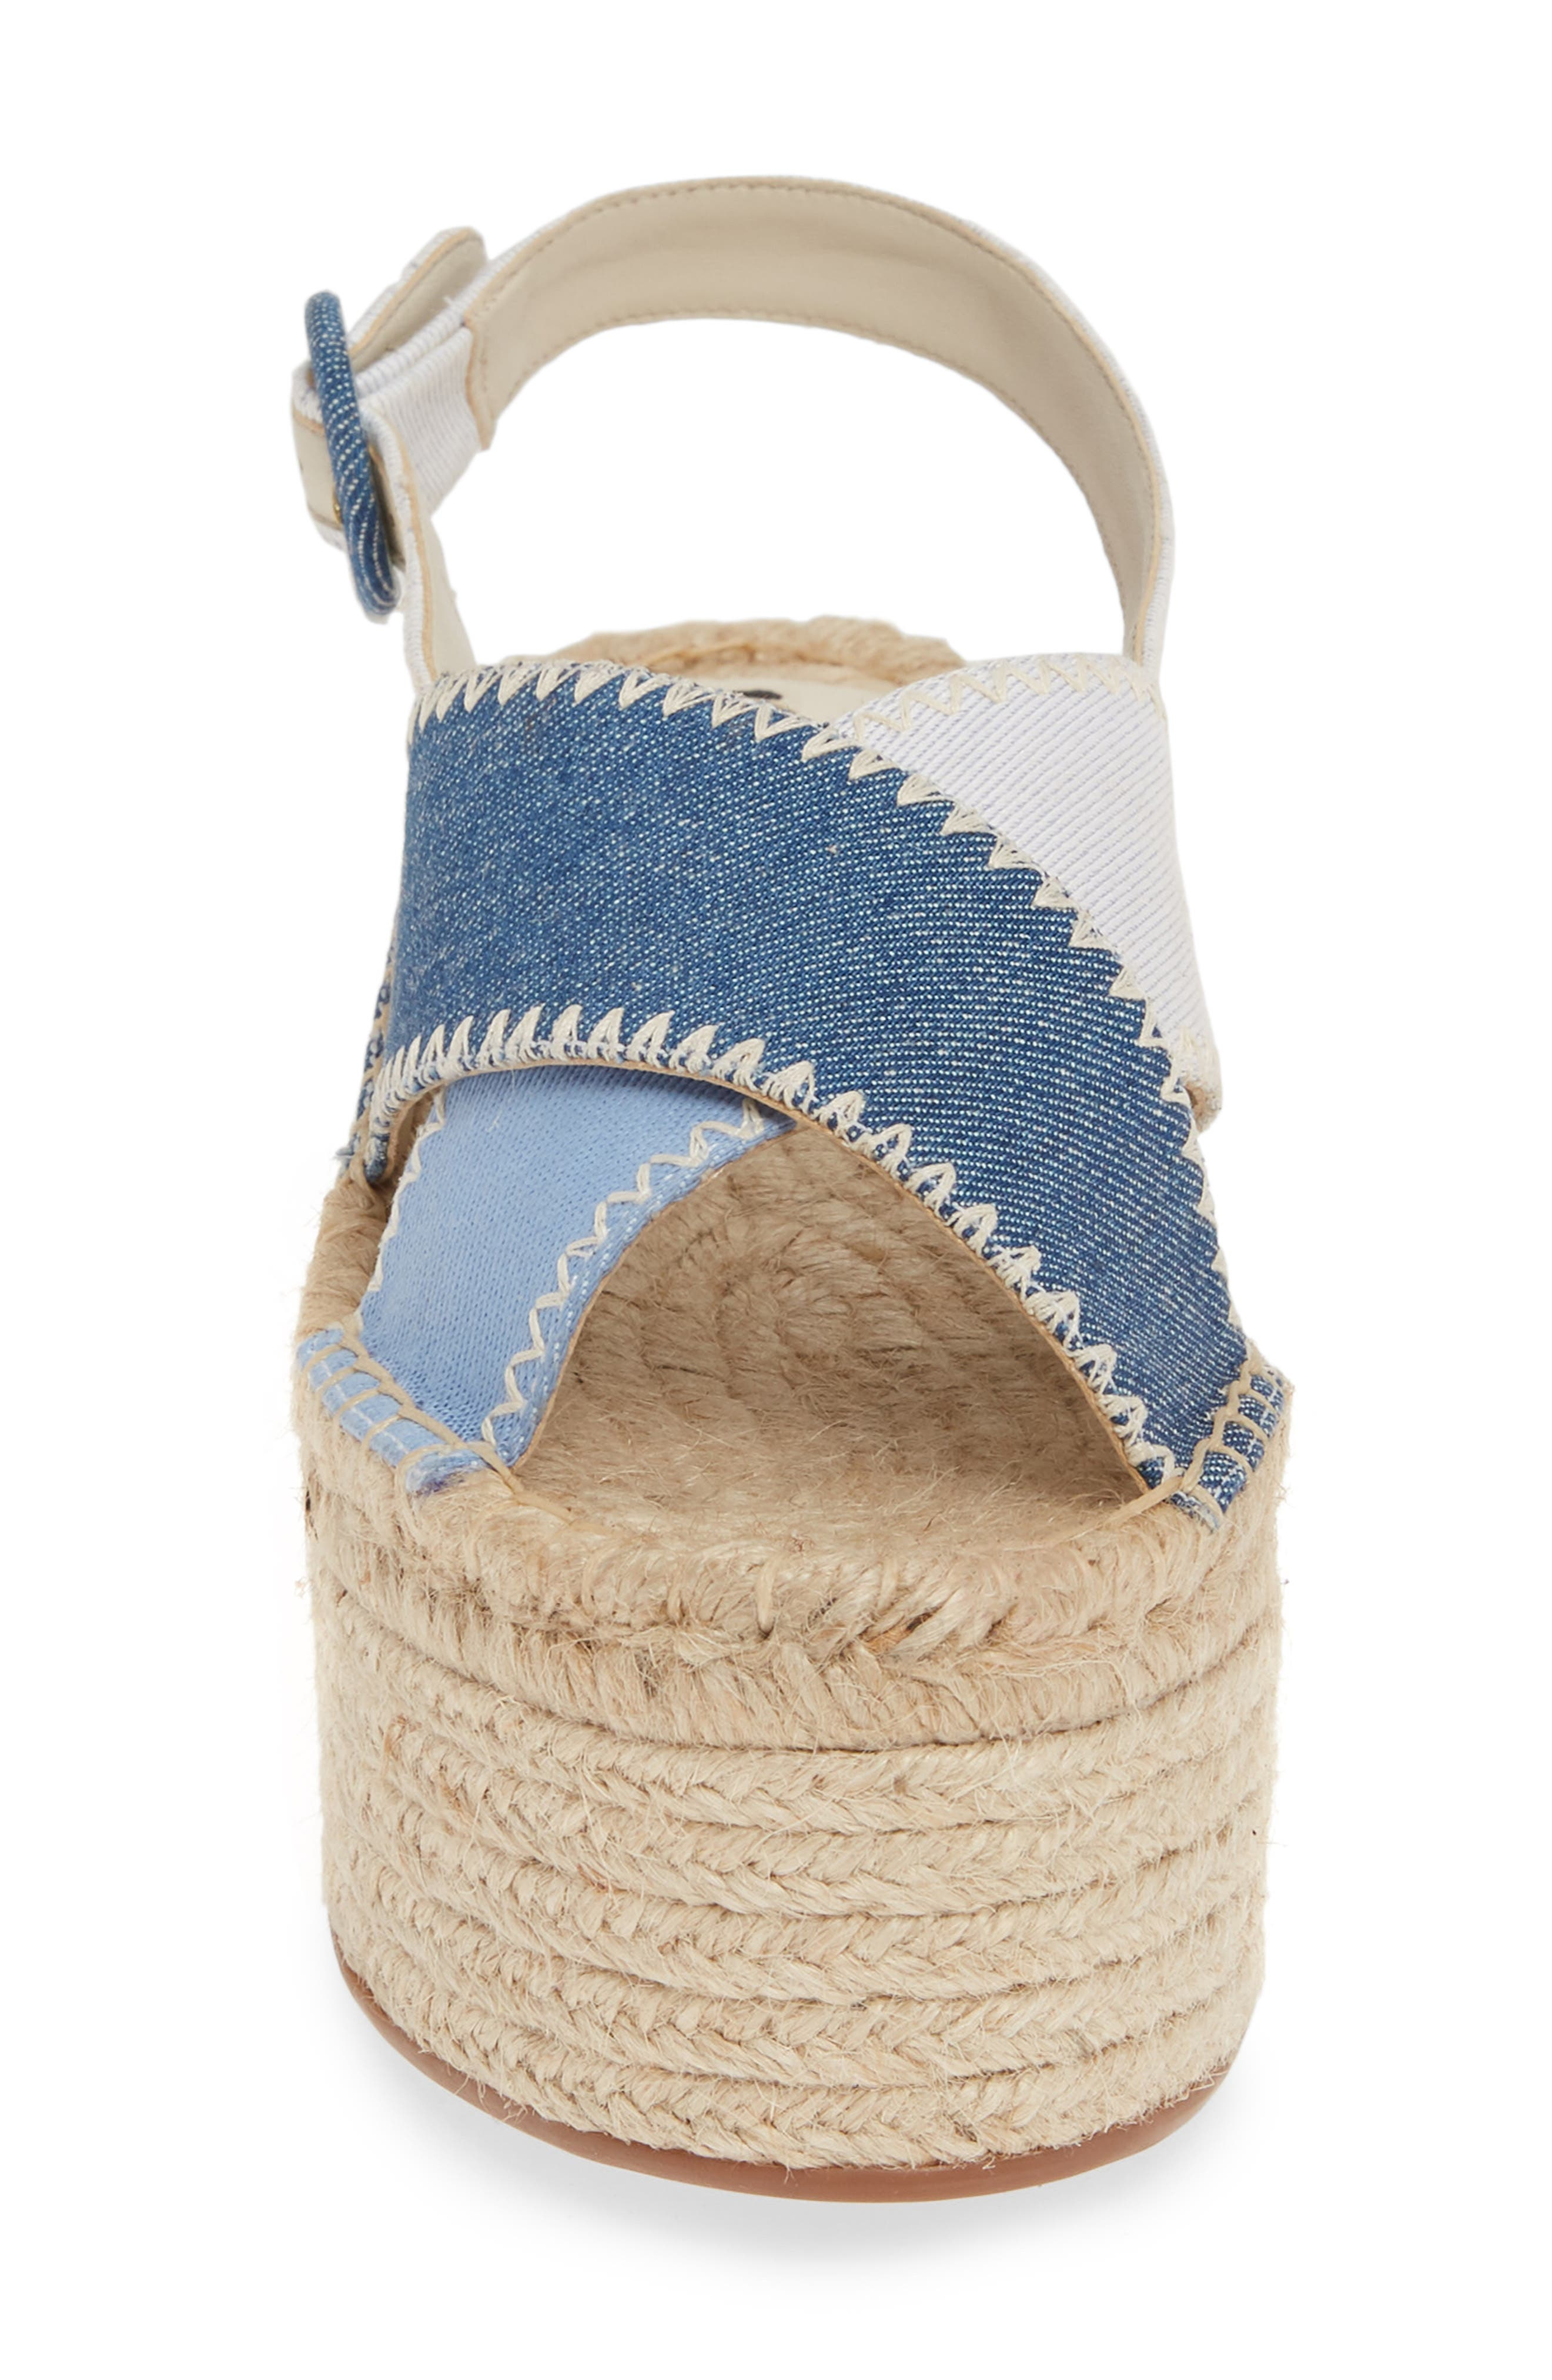 ALICE + OLIVIA, Fayen Platform Sandal, Alternate thumbnail 4, color, DARK BLUE/ LIGHT BLUE/ IVORY